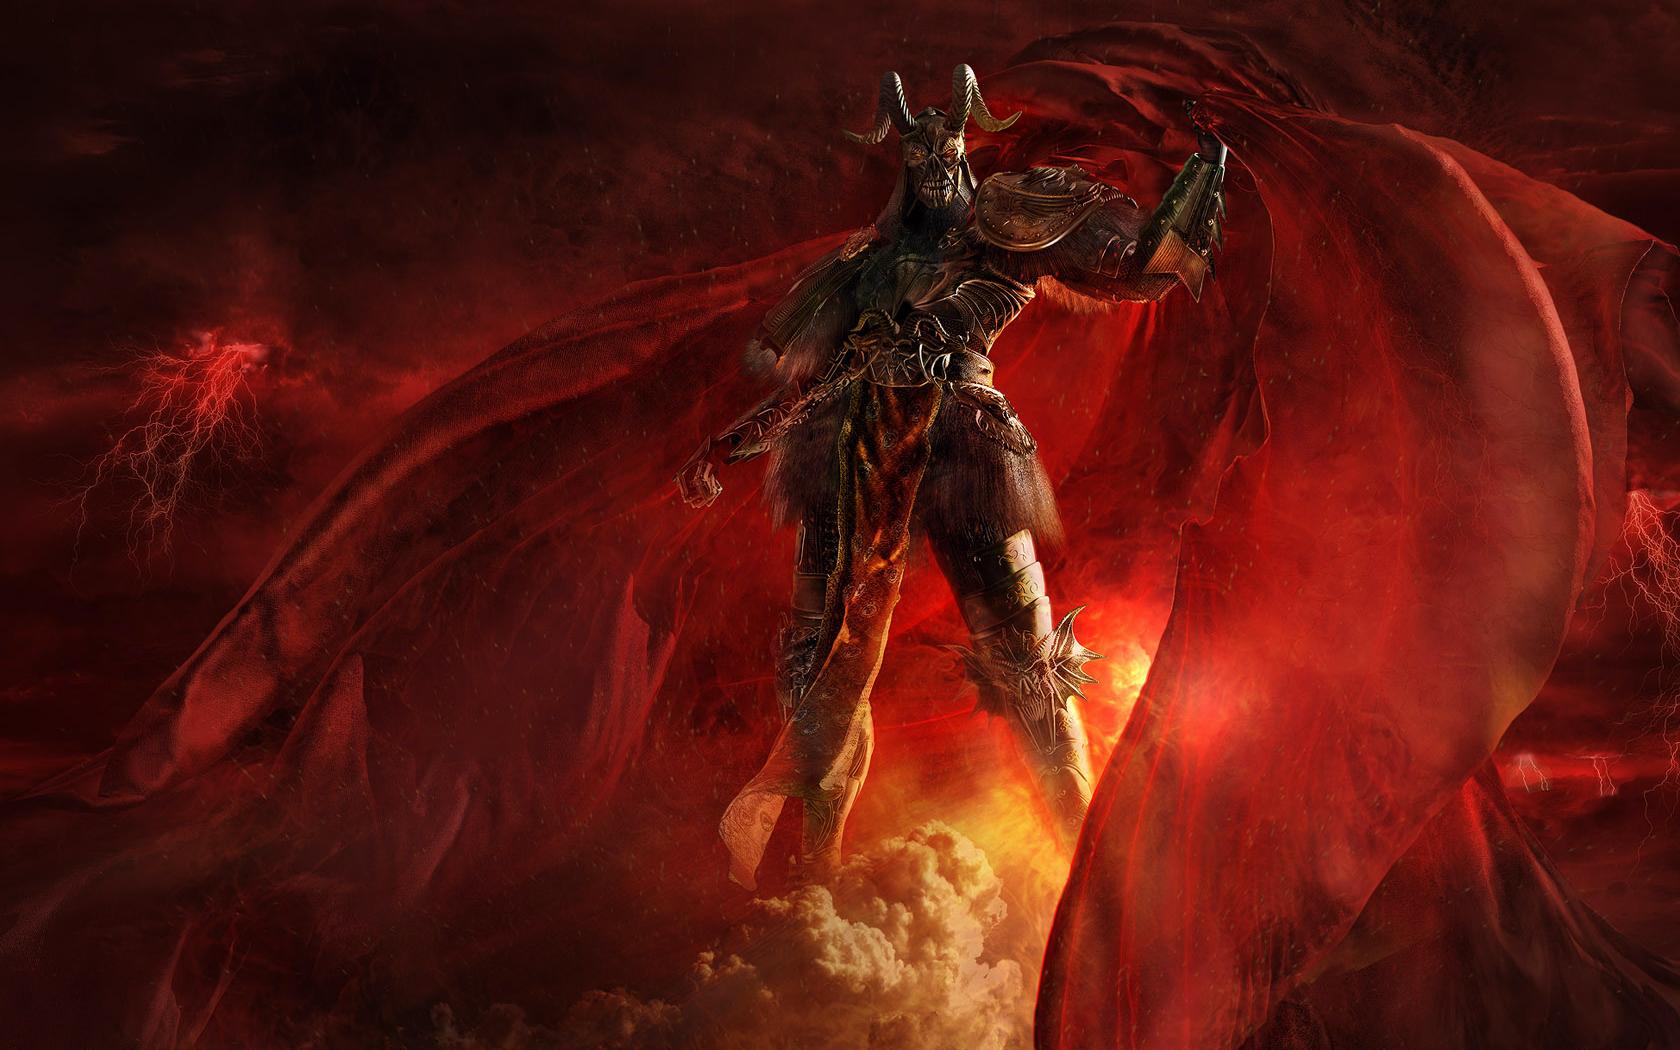 Dark Demon Wallpaper 1680x1050 Dark Demon 1680x1050